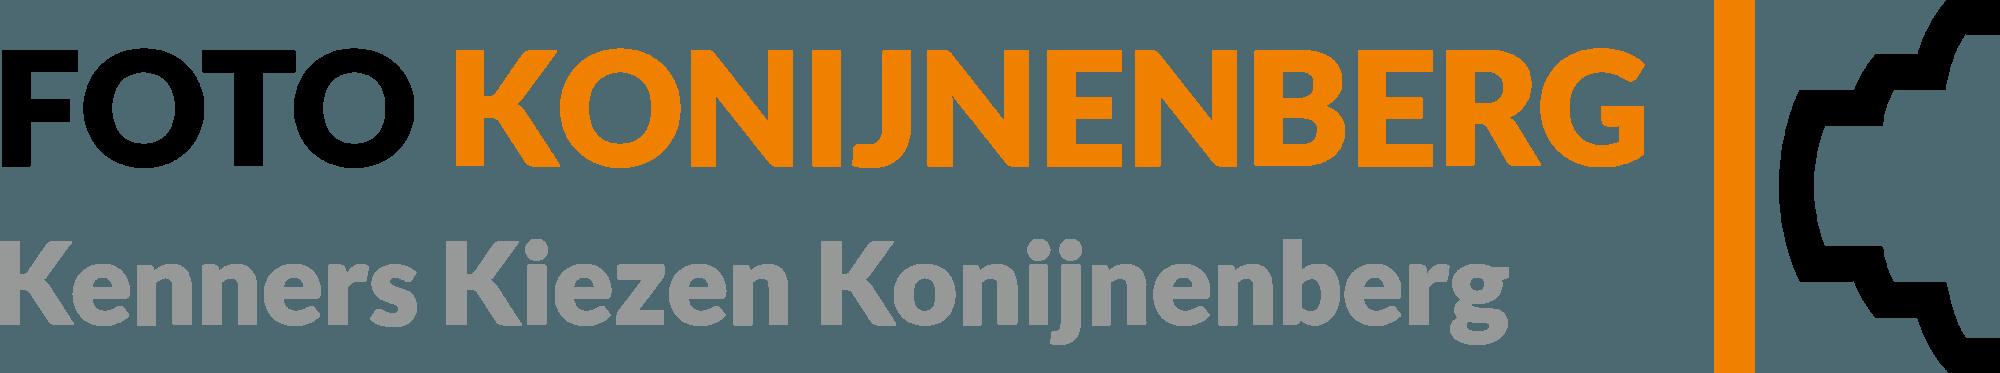 Black Friday Deals Fotokonijnenberg